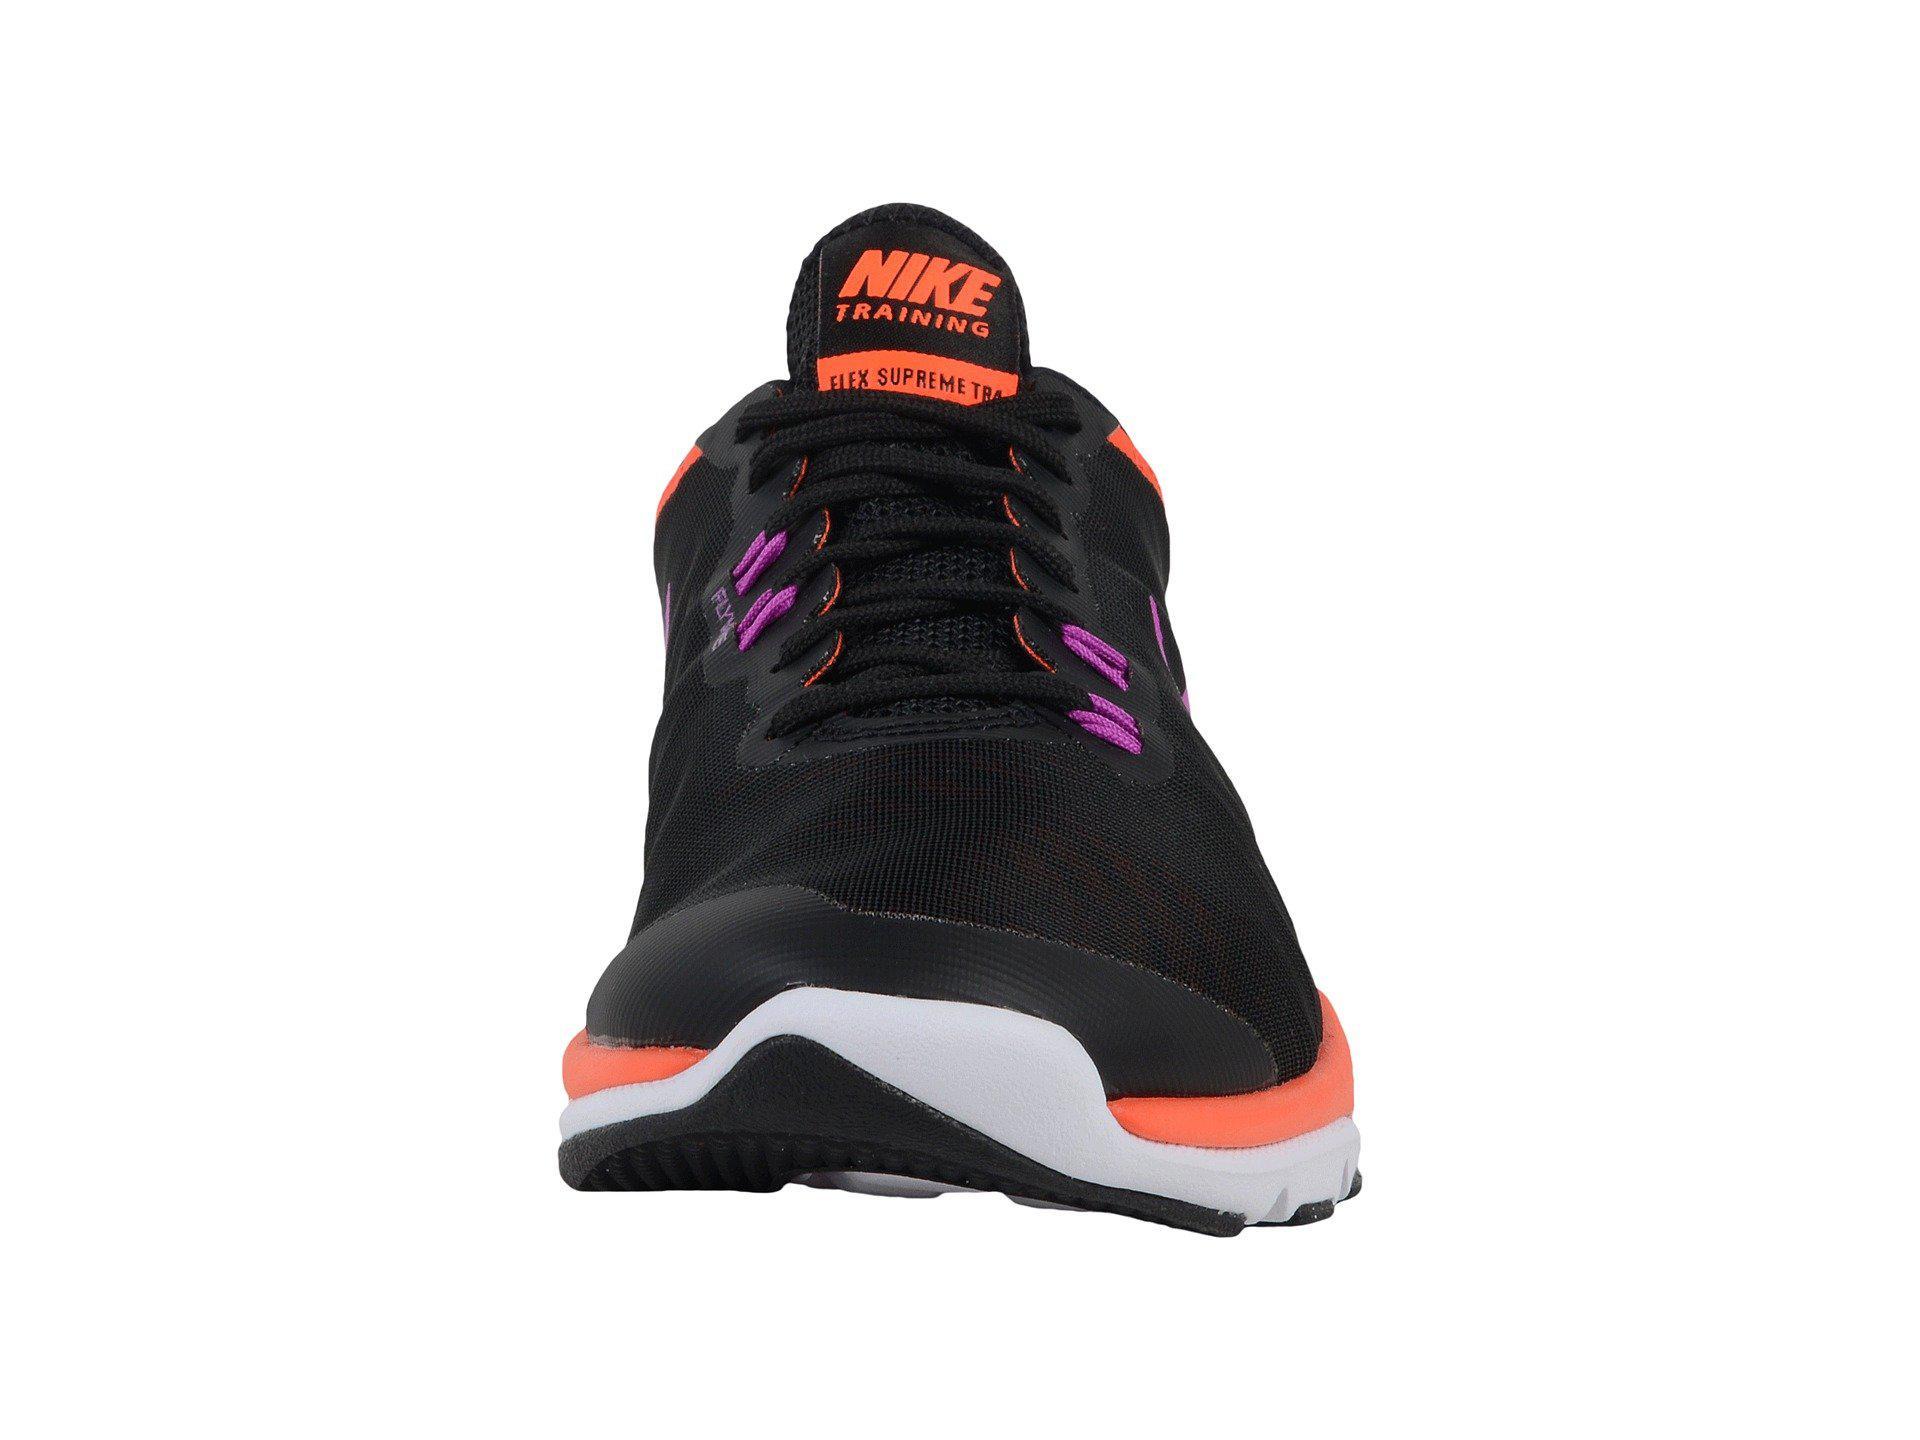 best service 1a092 6d394 Lyst - Nike Flex Supreme Tr4 in Black